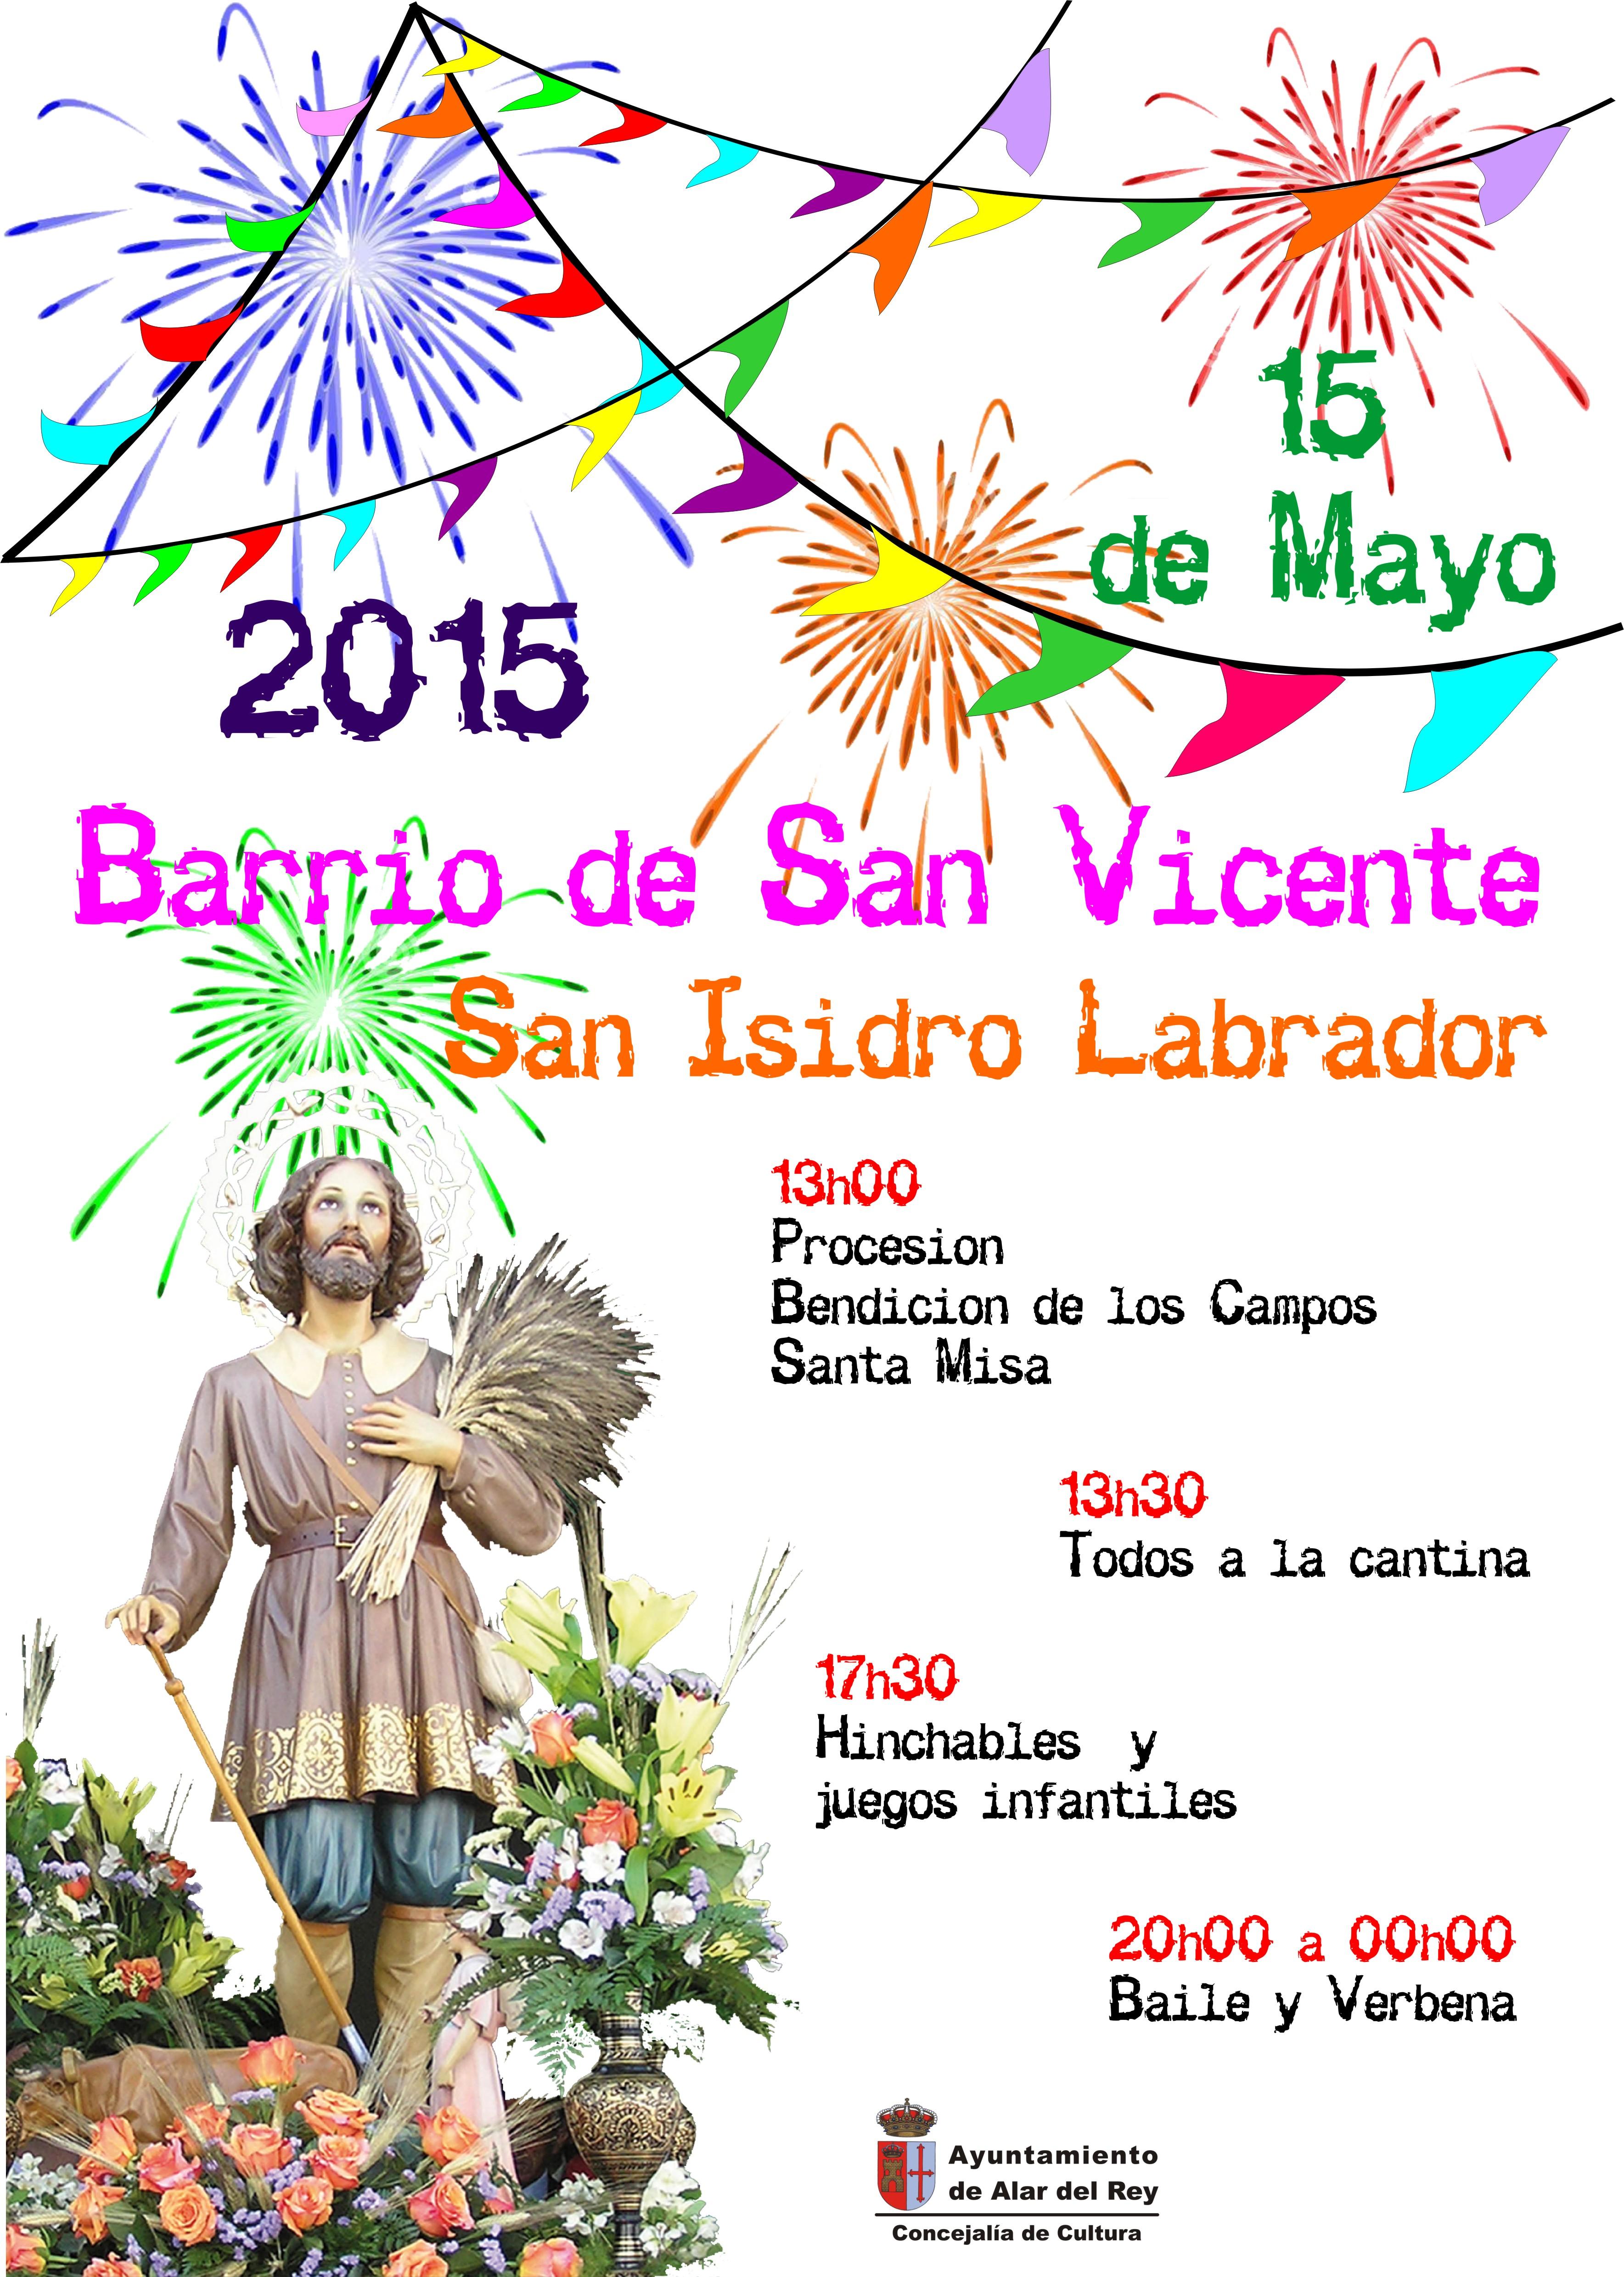 FIESTAS SAN ISIDRO 2015, BARRIO DE SAN VICENTE